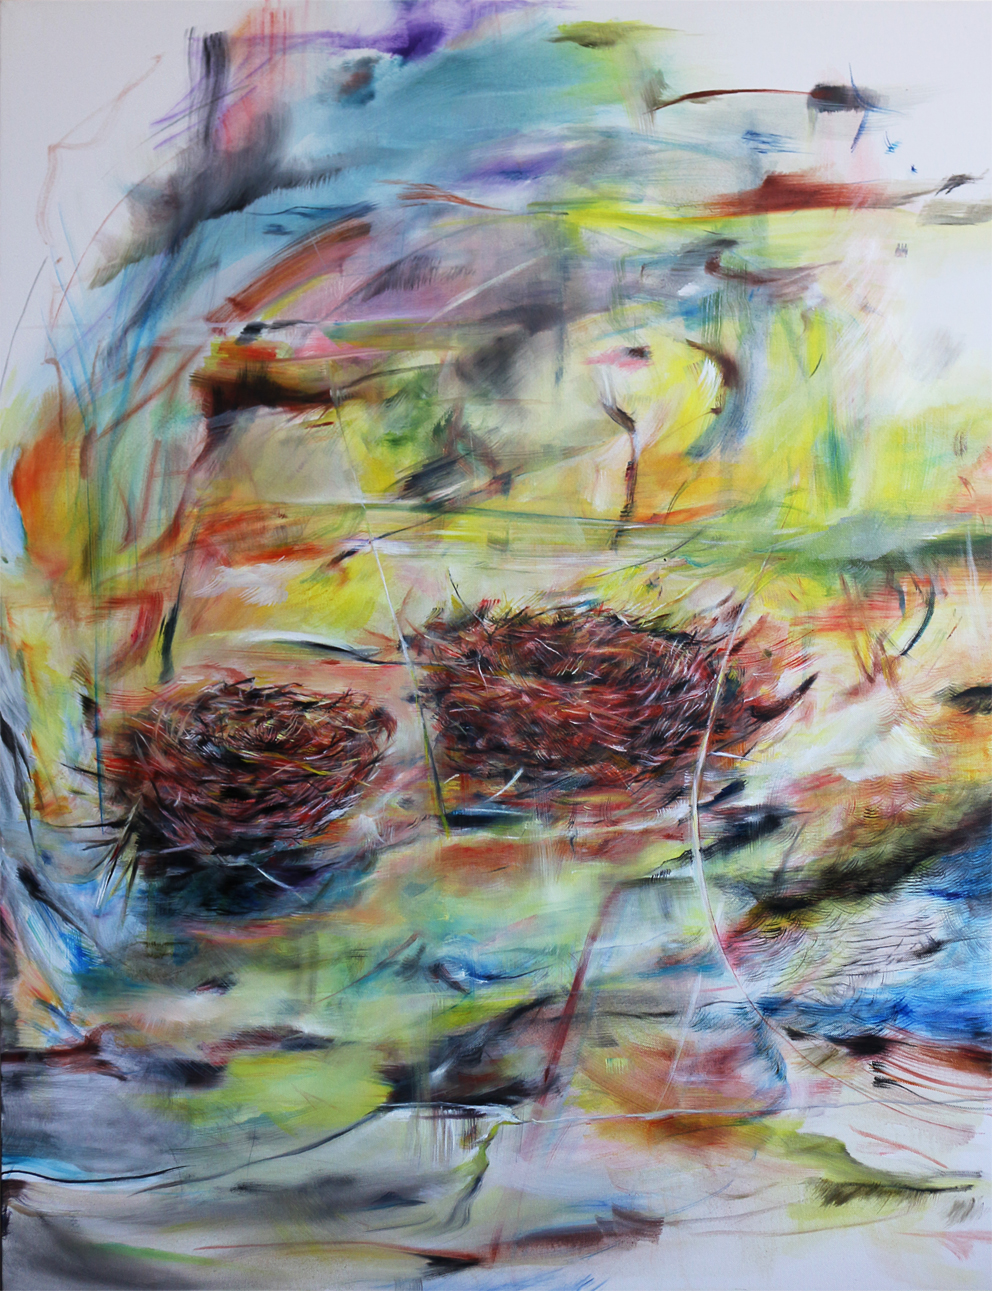 Hnízda , olej na plátně, 105 x 80 cm rok 2014, cena 18 000Kč